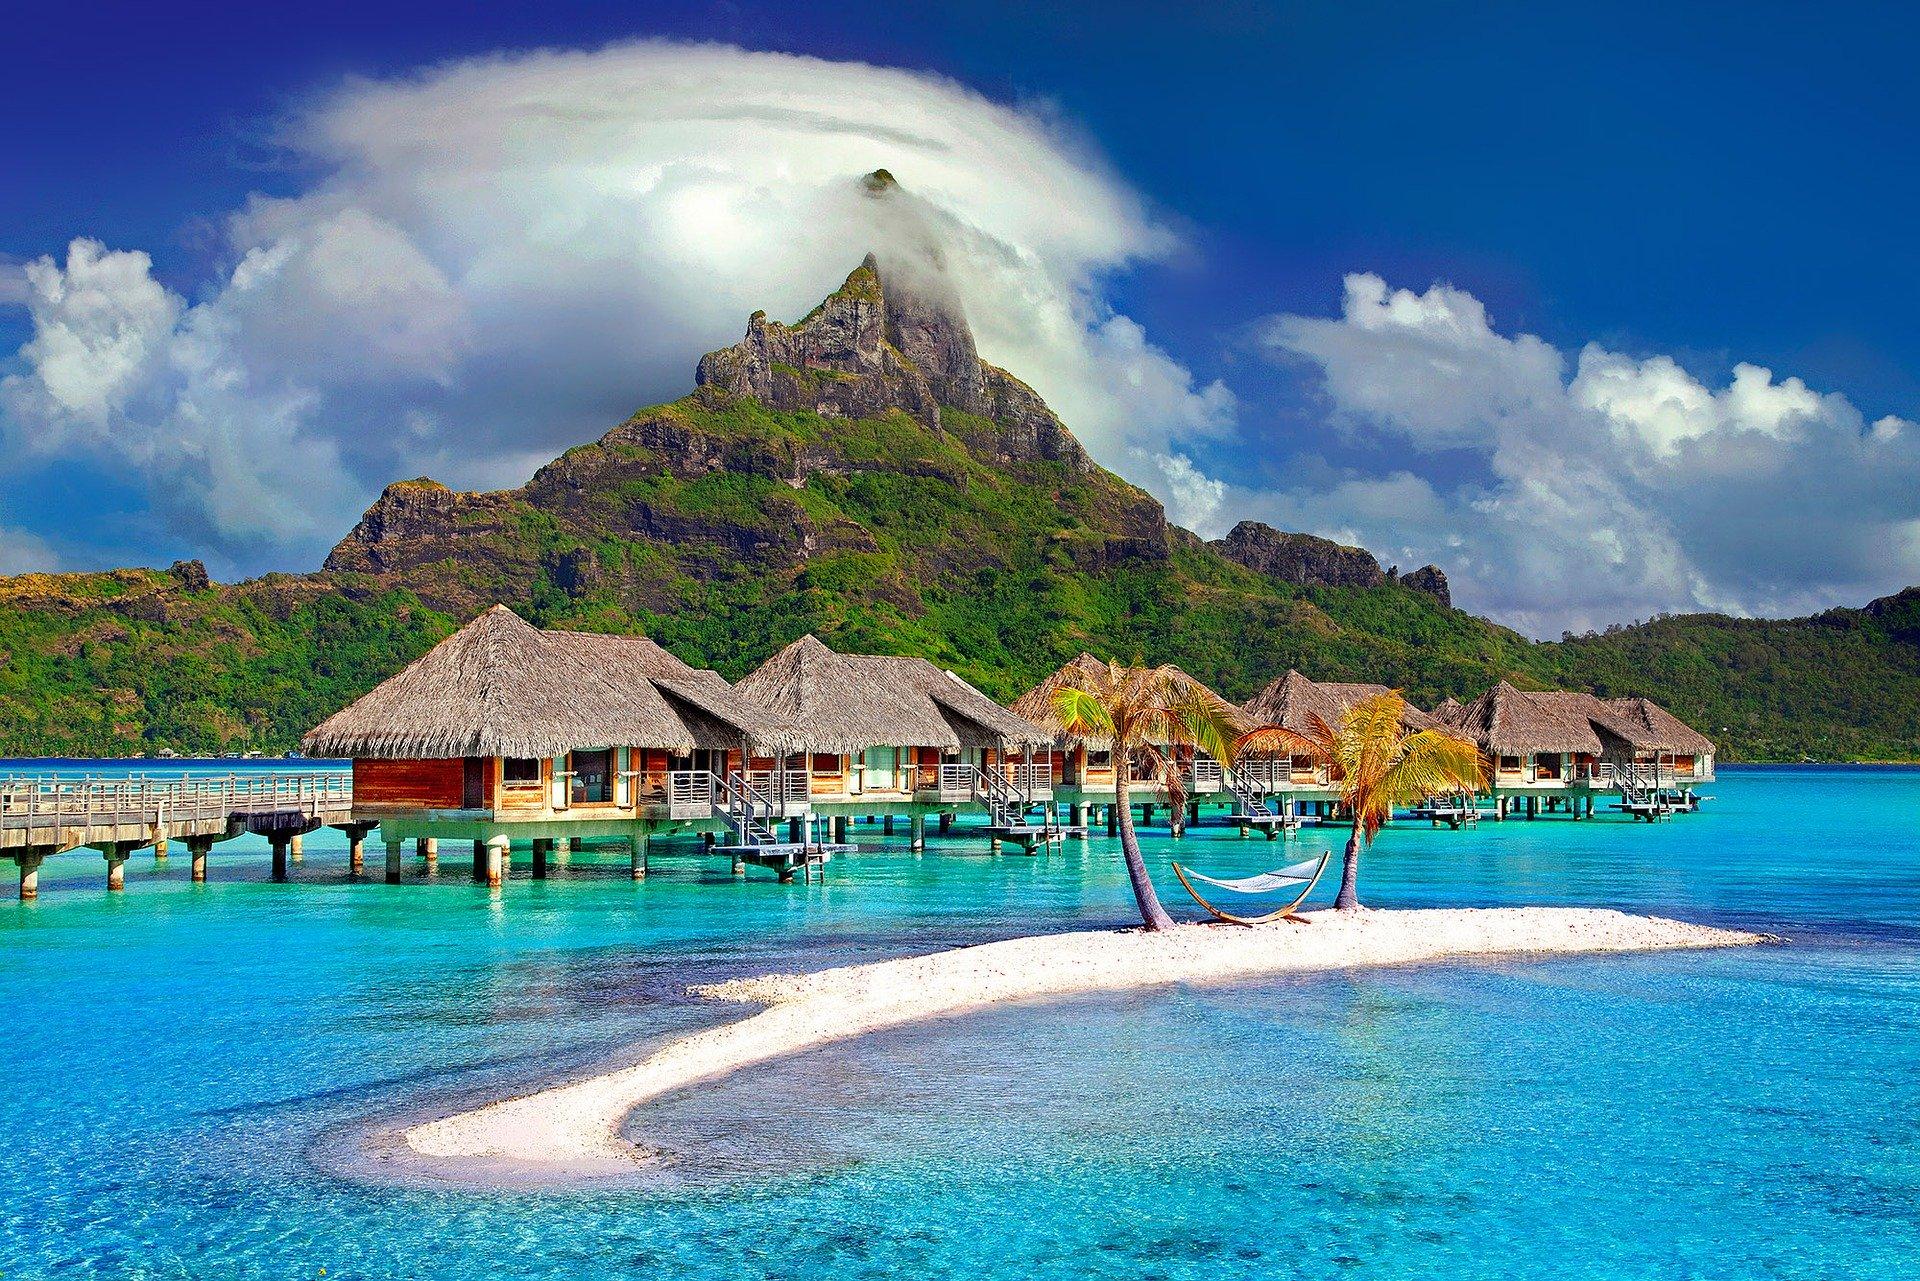 Destination image of French Polynesia